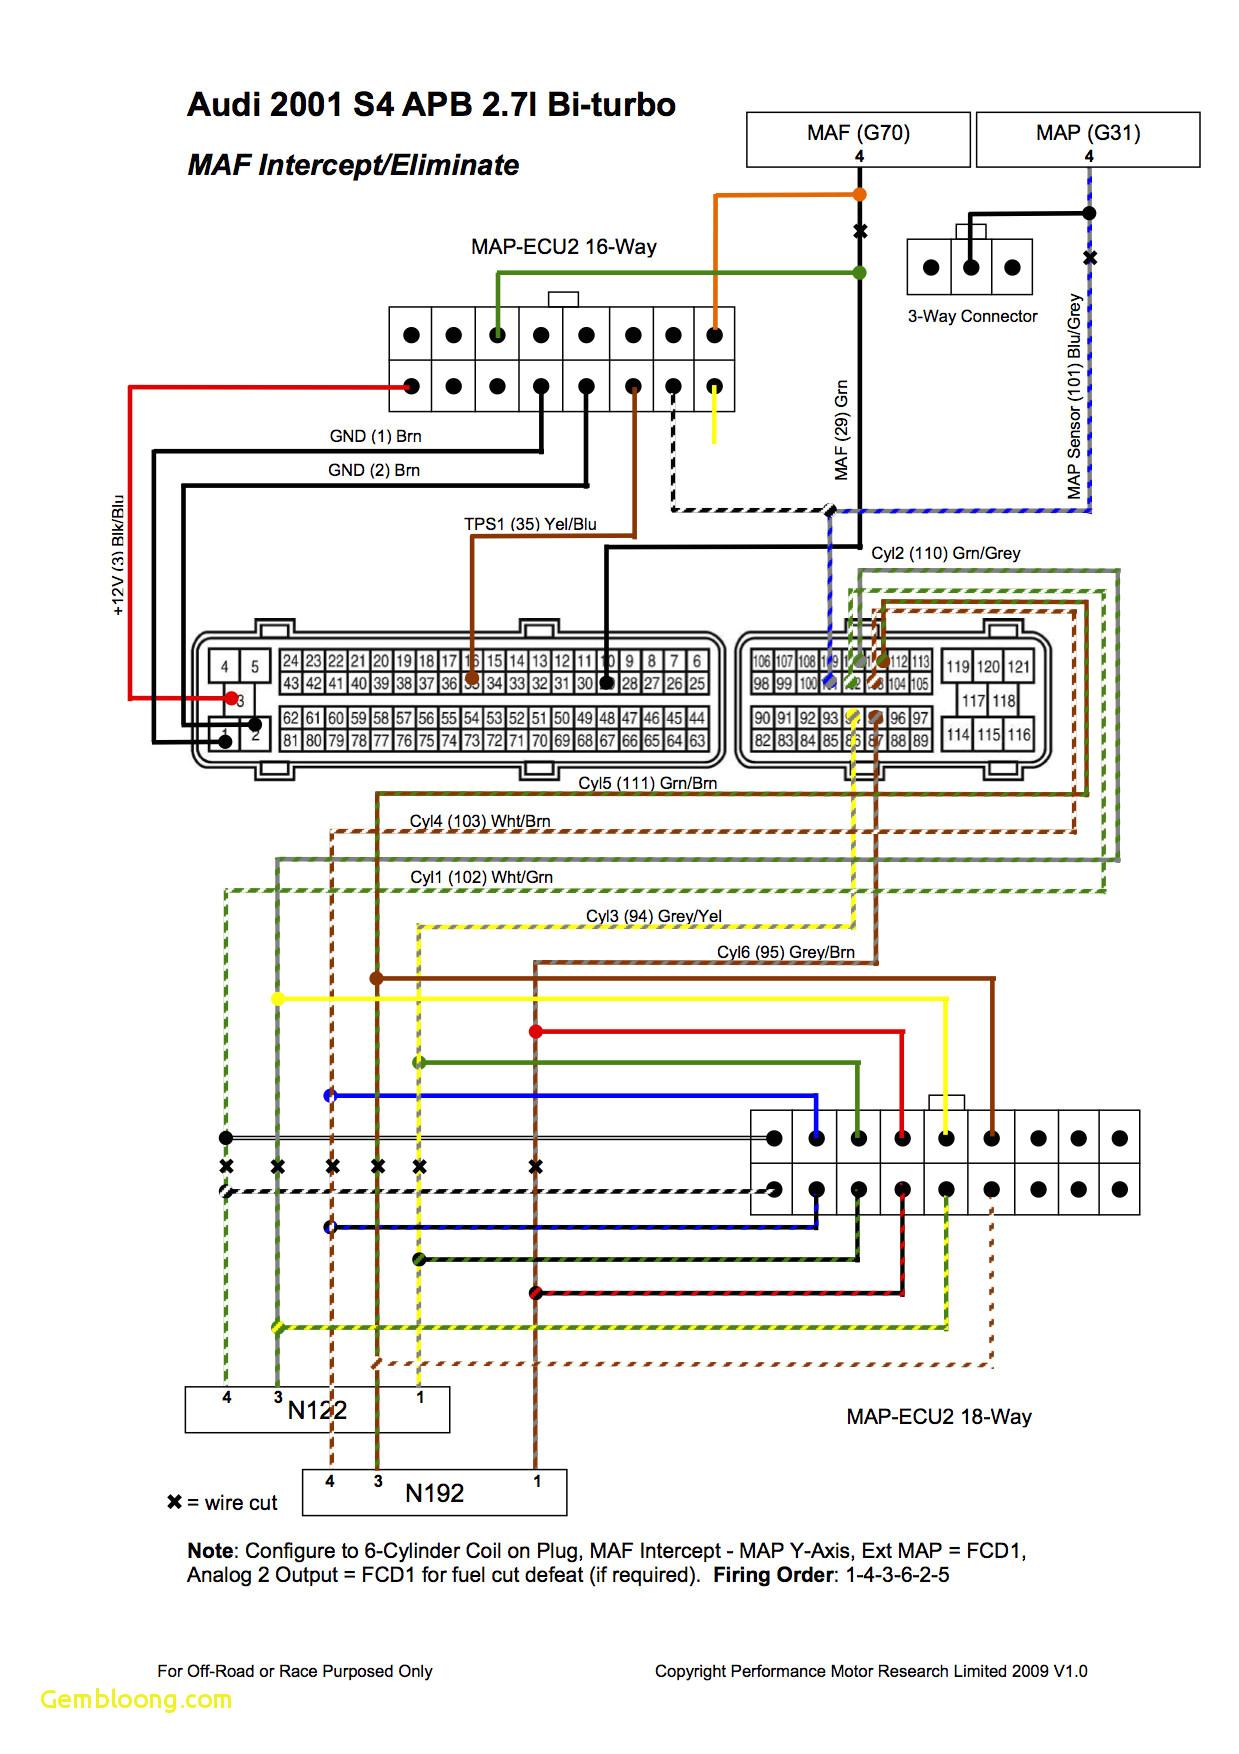 download bmw dme wiring diagram ecu afif of huntern switch library jpg